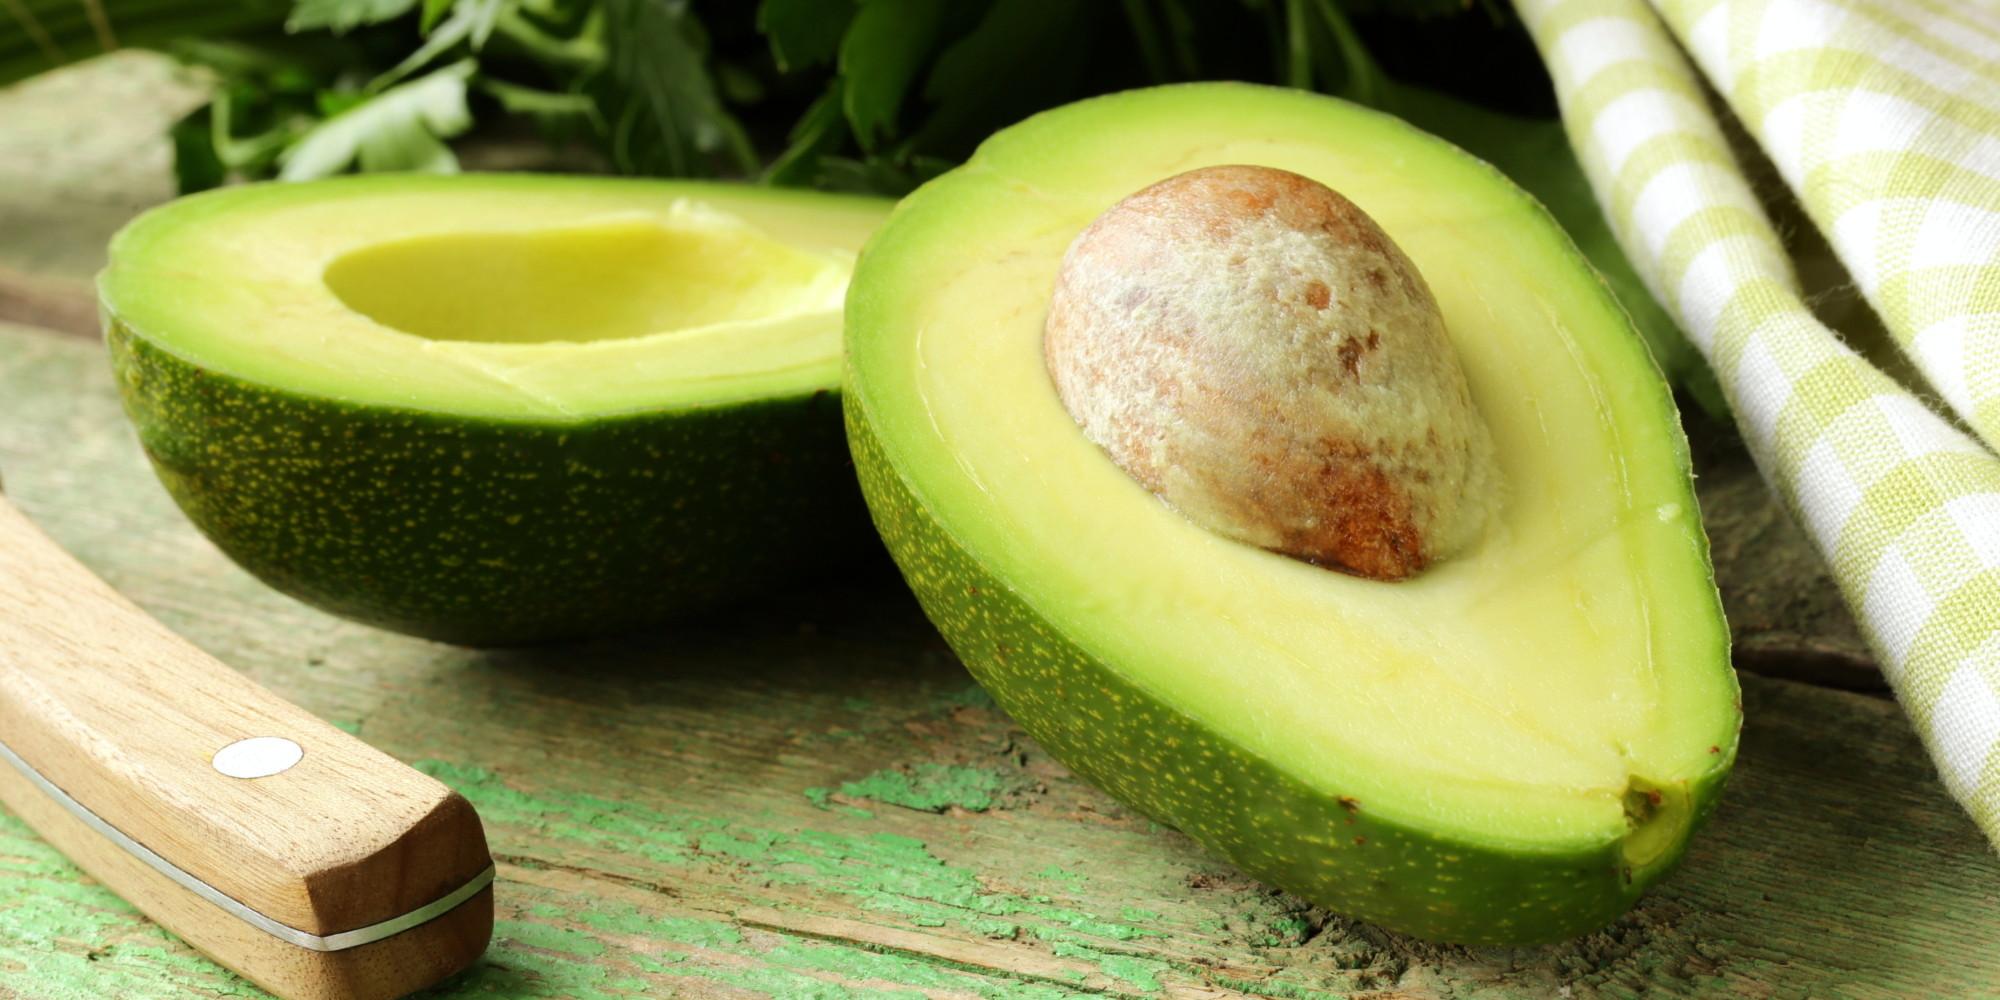 http://www.huffingtonpost.com/2015/01/08/avocado-health-benefits_n_6420286.html?ir=Healthy+Living